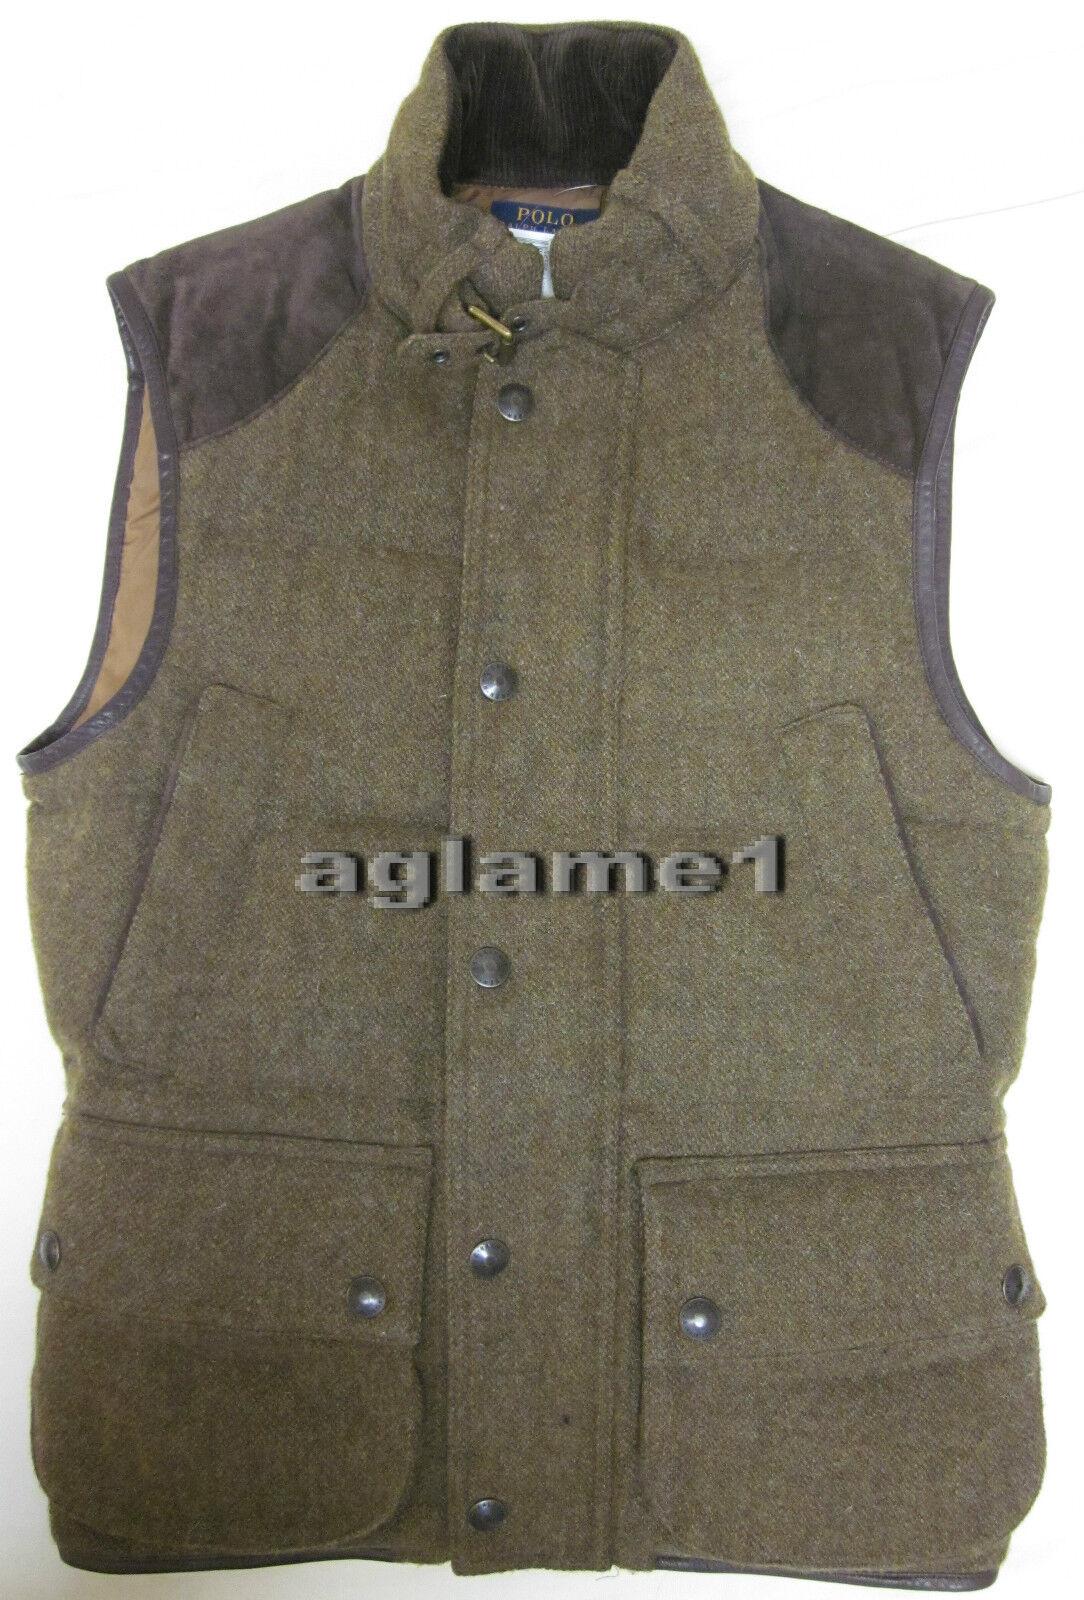 NWT Ralph Lauren wool down Leder trim hunting vest S Small